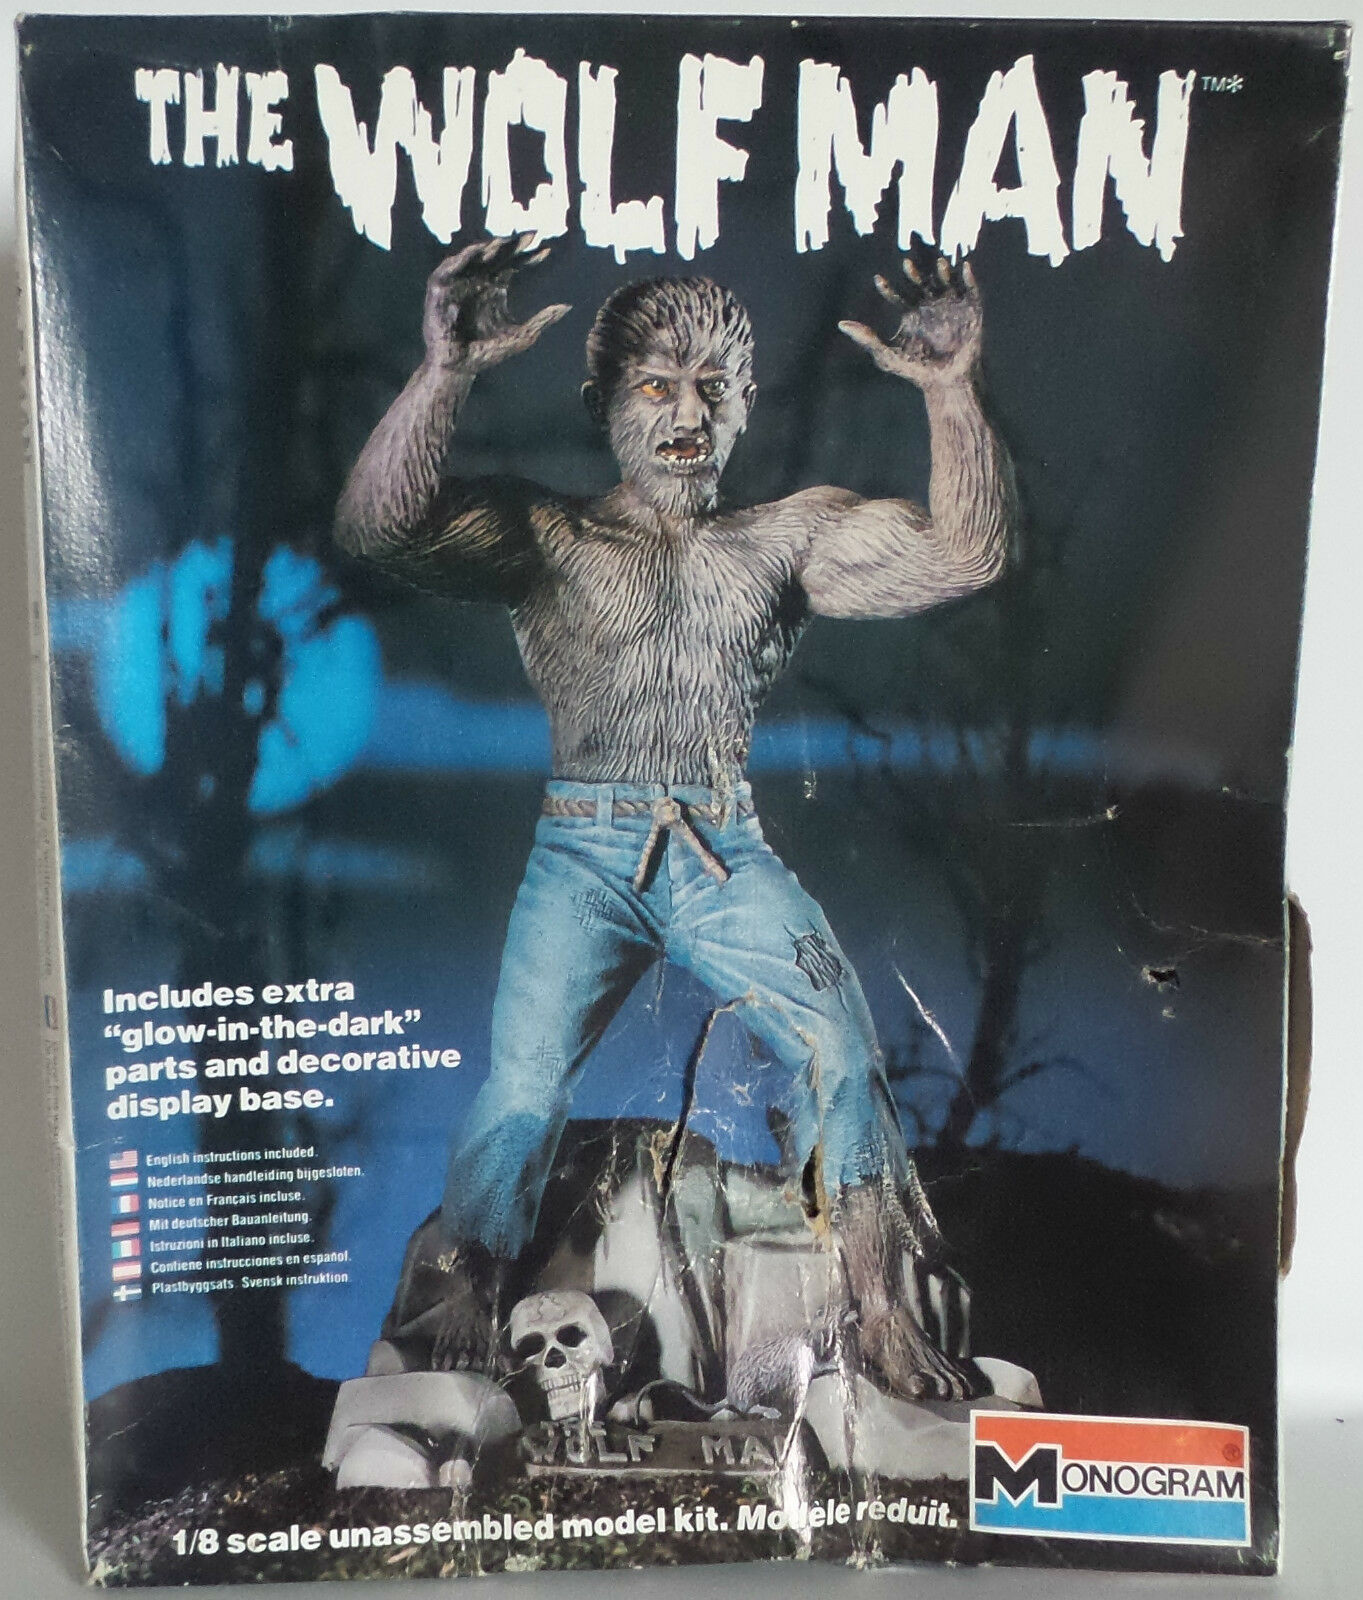 HORROR   1983 1 8 SCALE THE WOLF MAN GLOW IN THE DARK MONOGRAM MODEL KIT (MLFP)